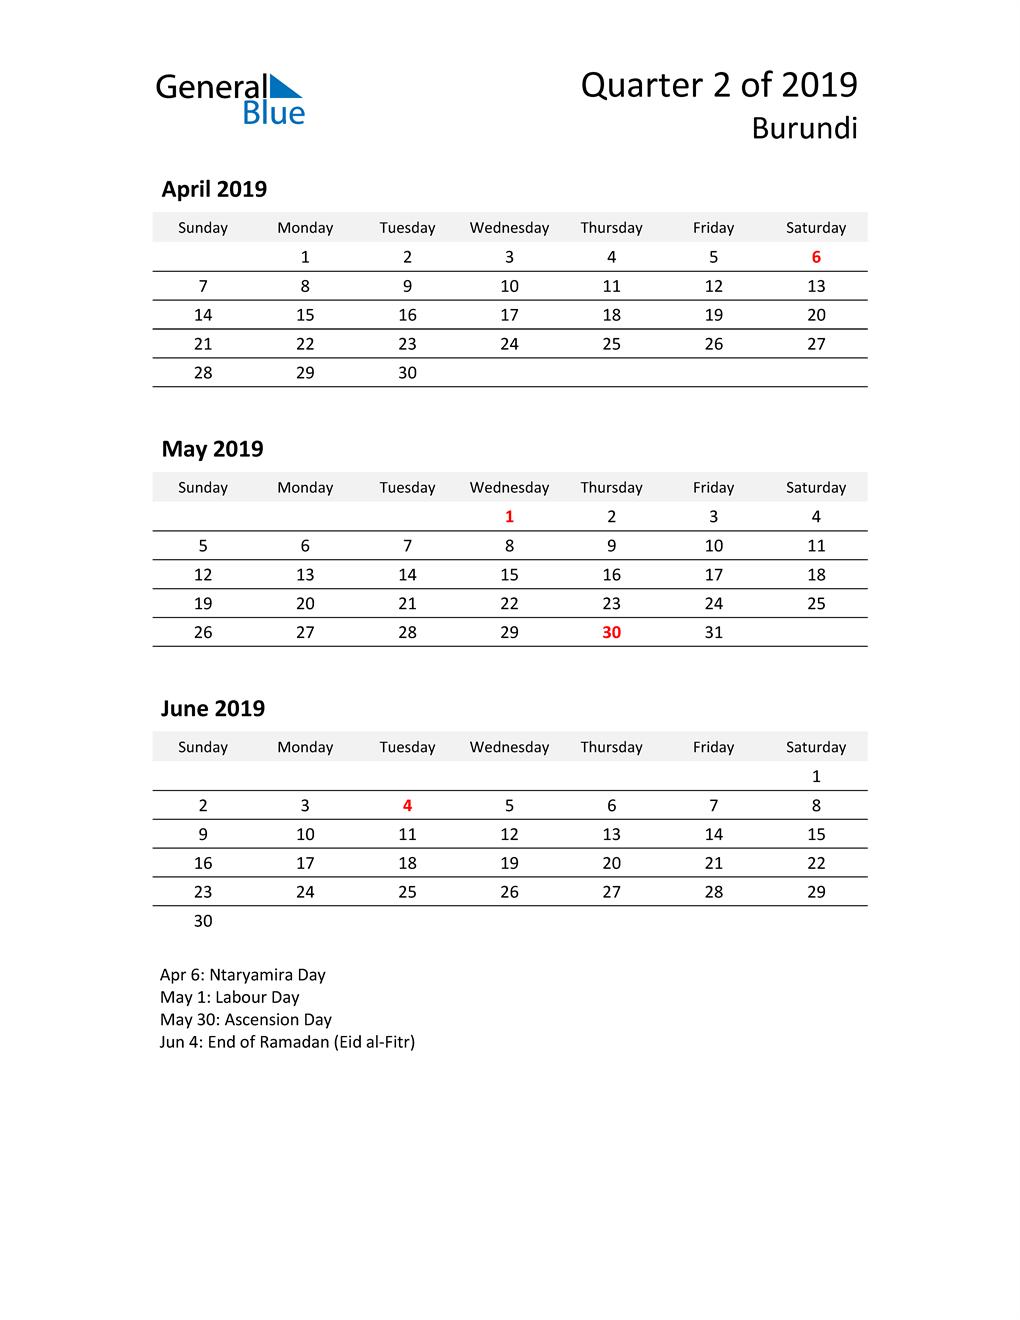 2019 Three-Month Calendar for Burundi